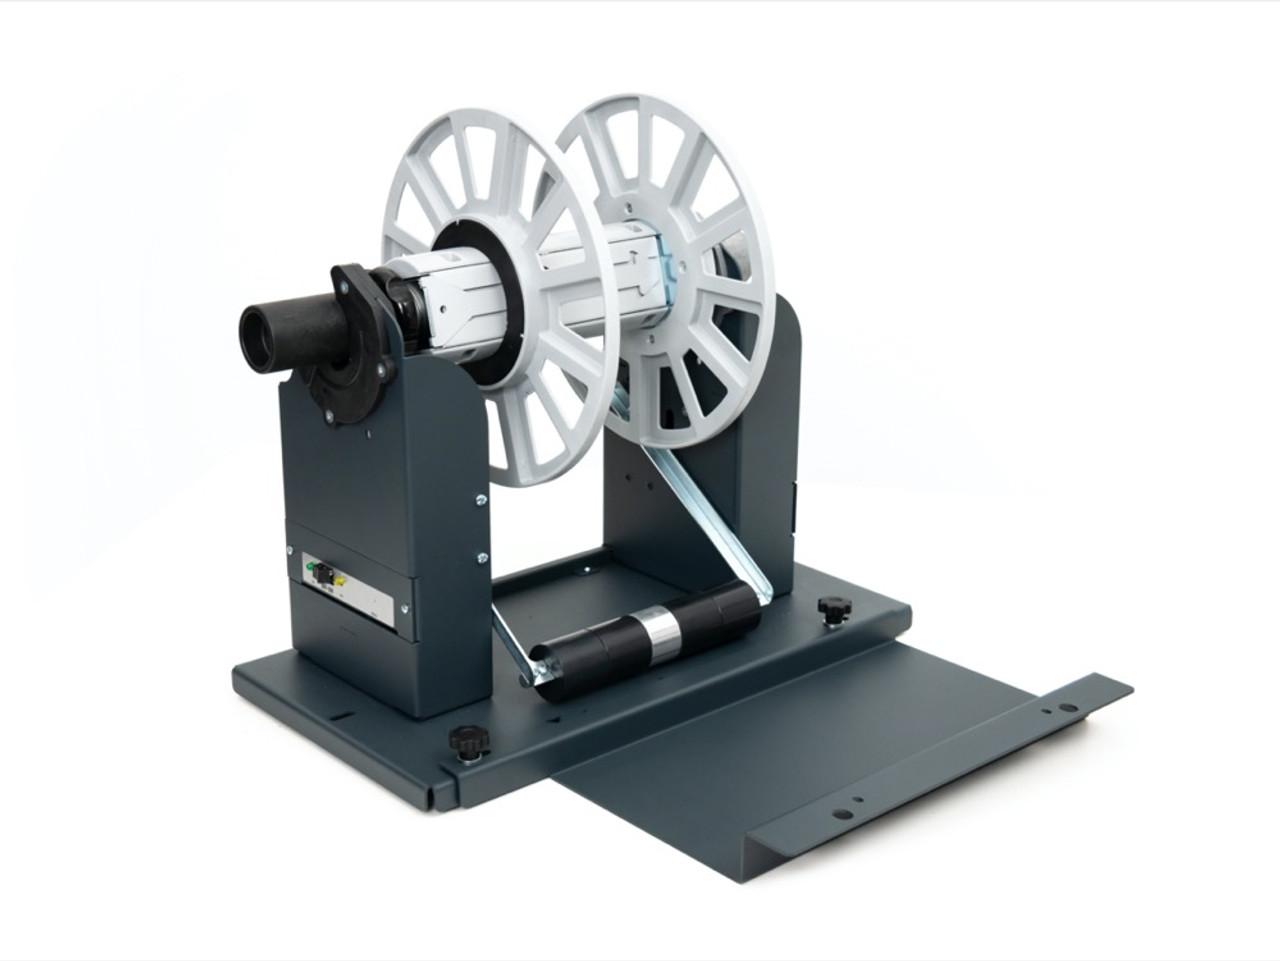 Afinia LT5C Rewinder for LT5C label printer